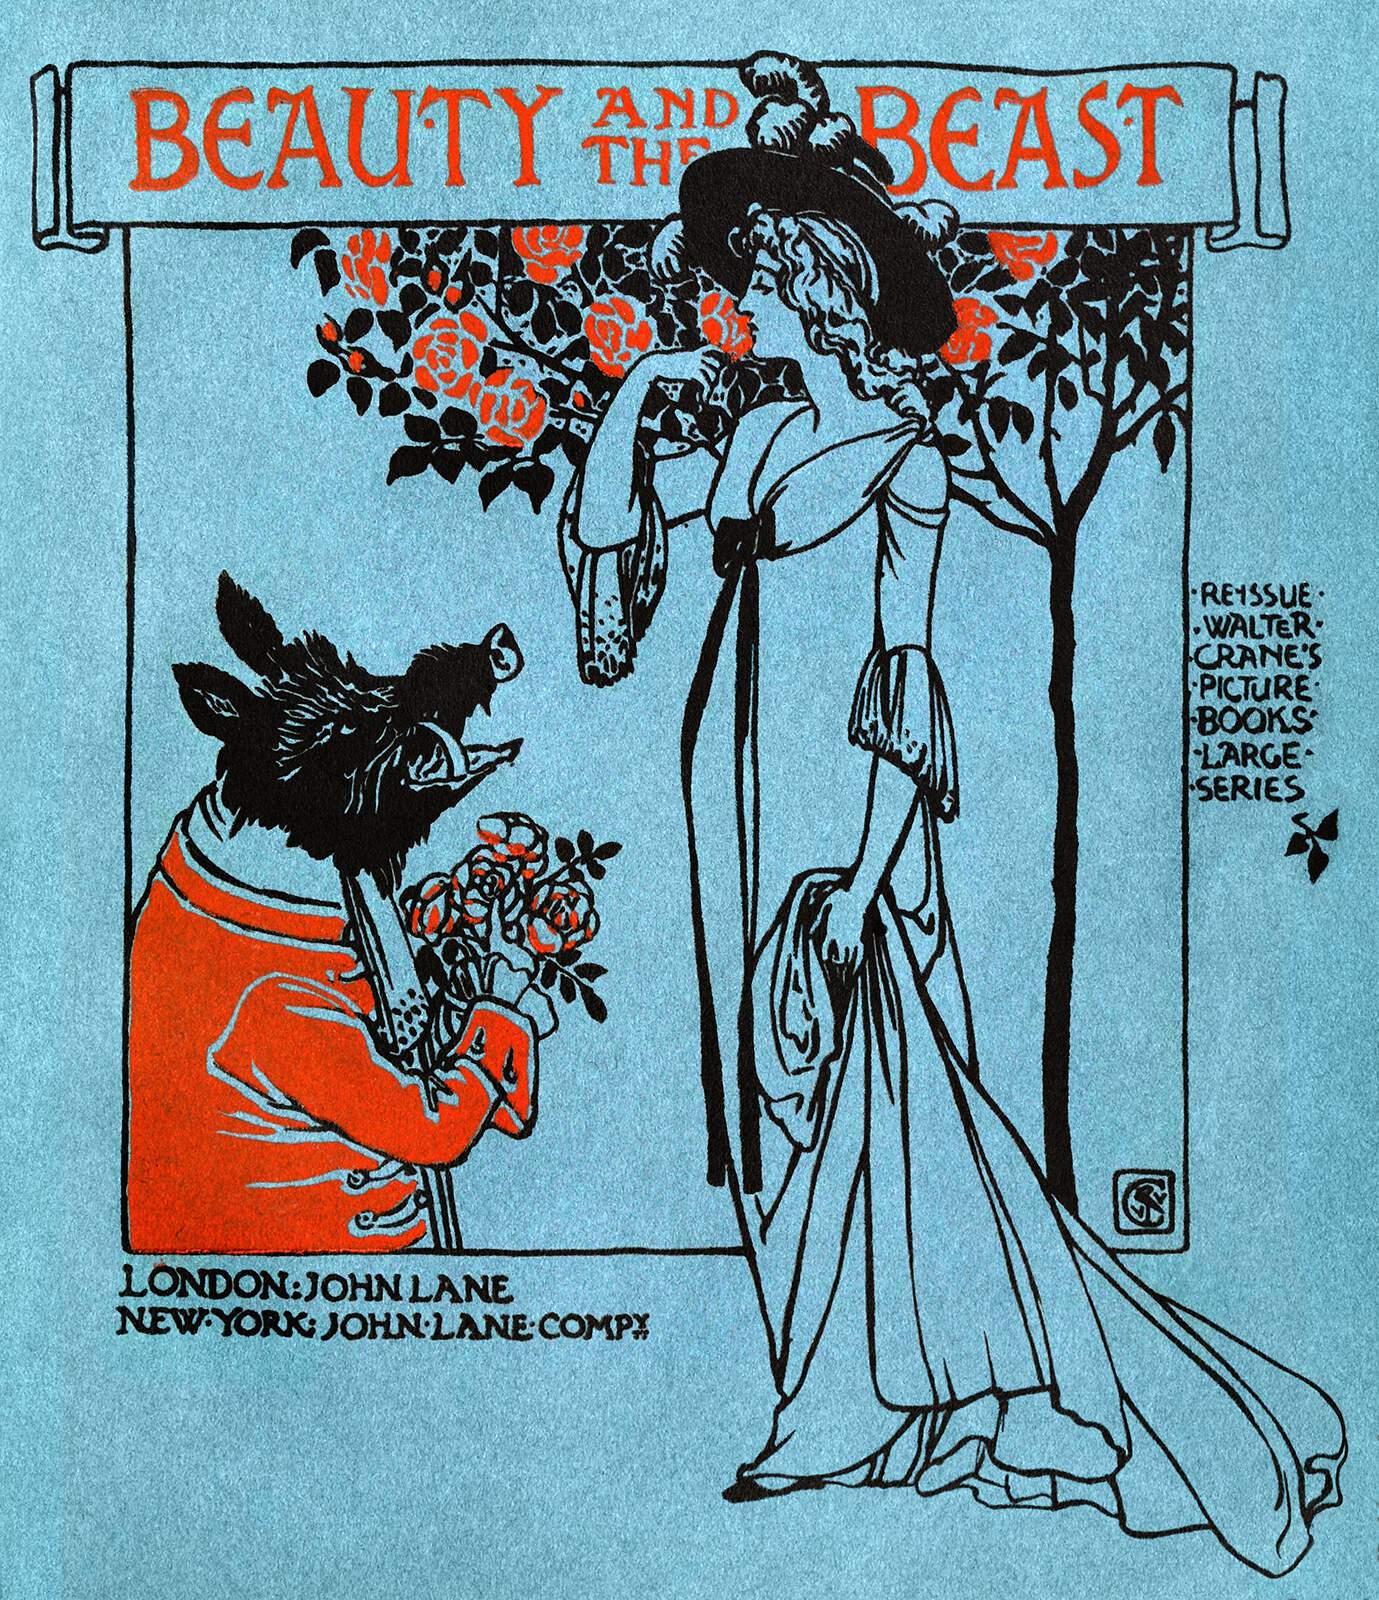 beauty-beast-cover-1600.jpg (1379×1600)